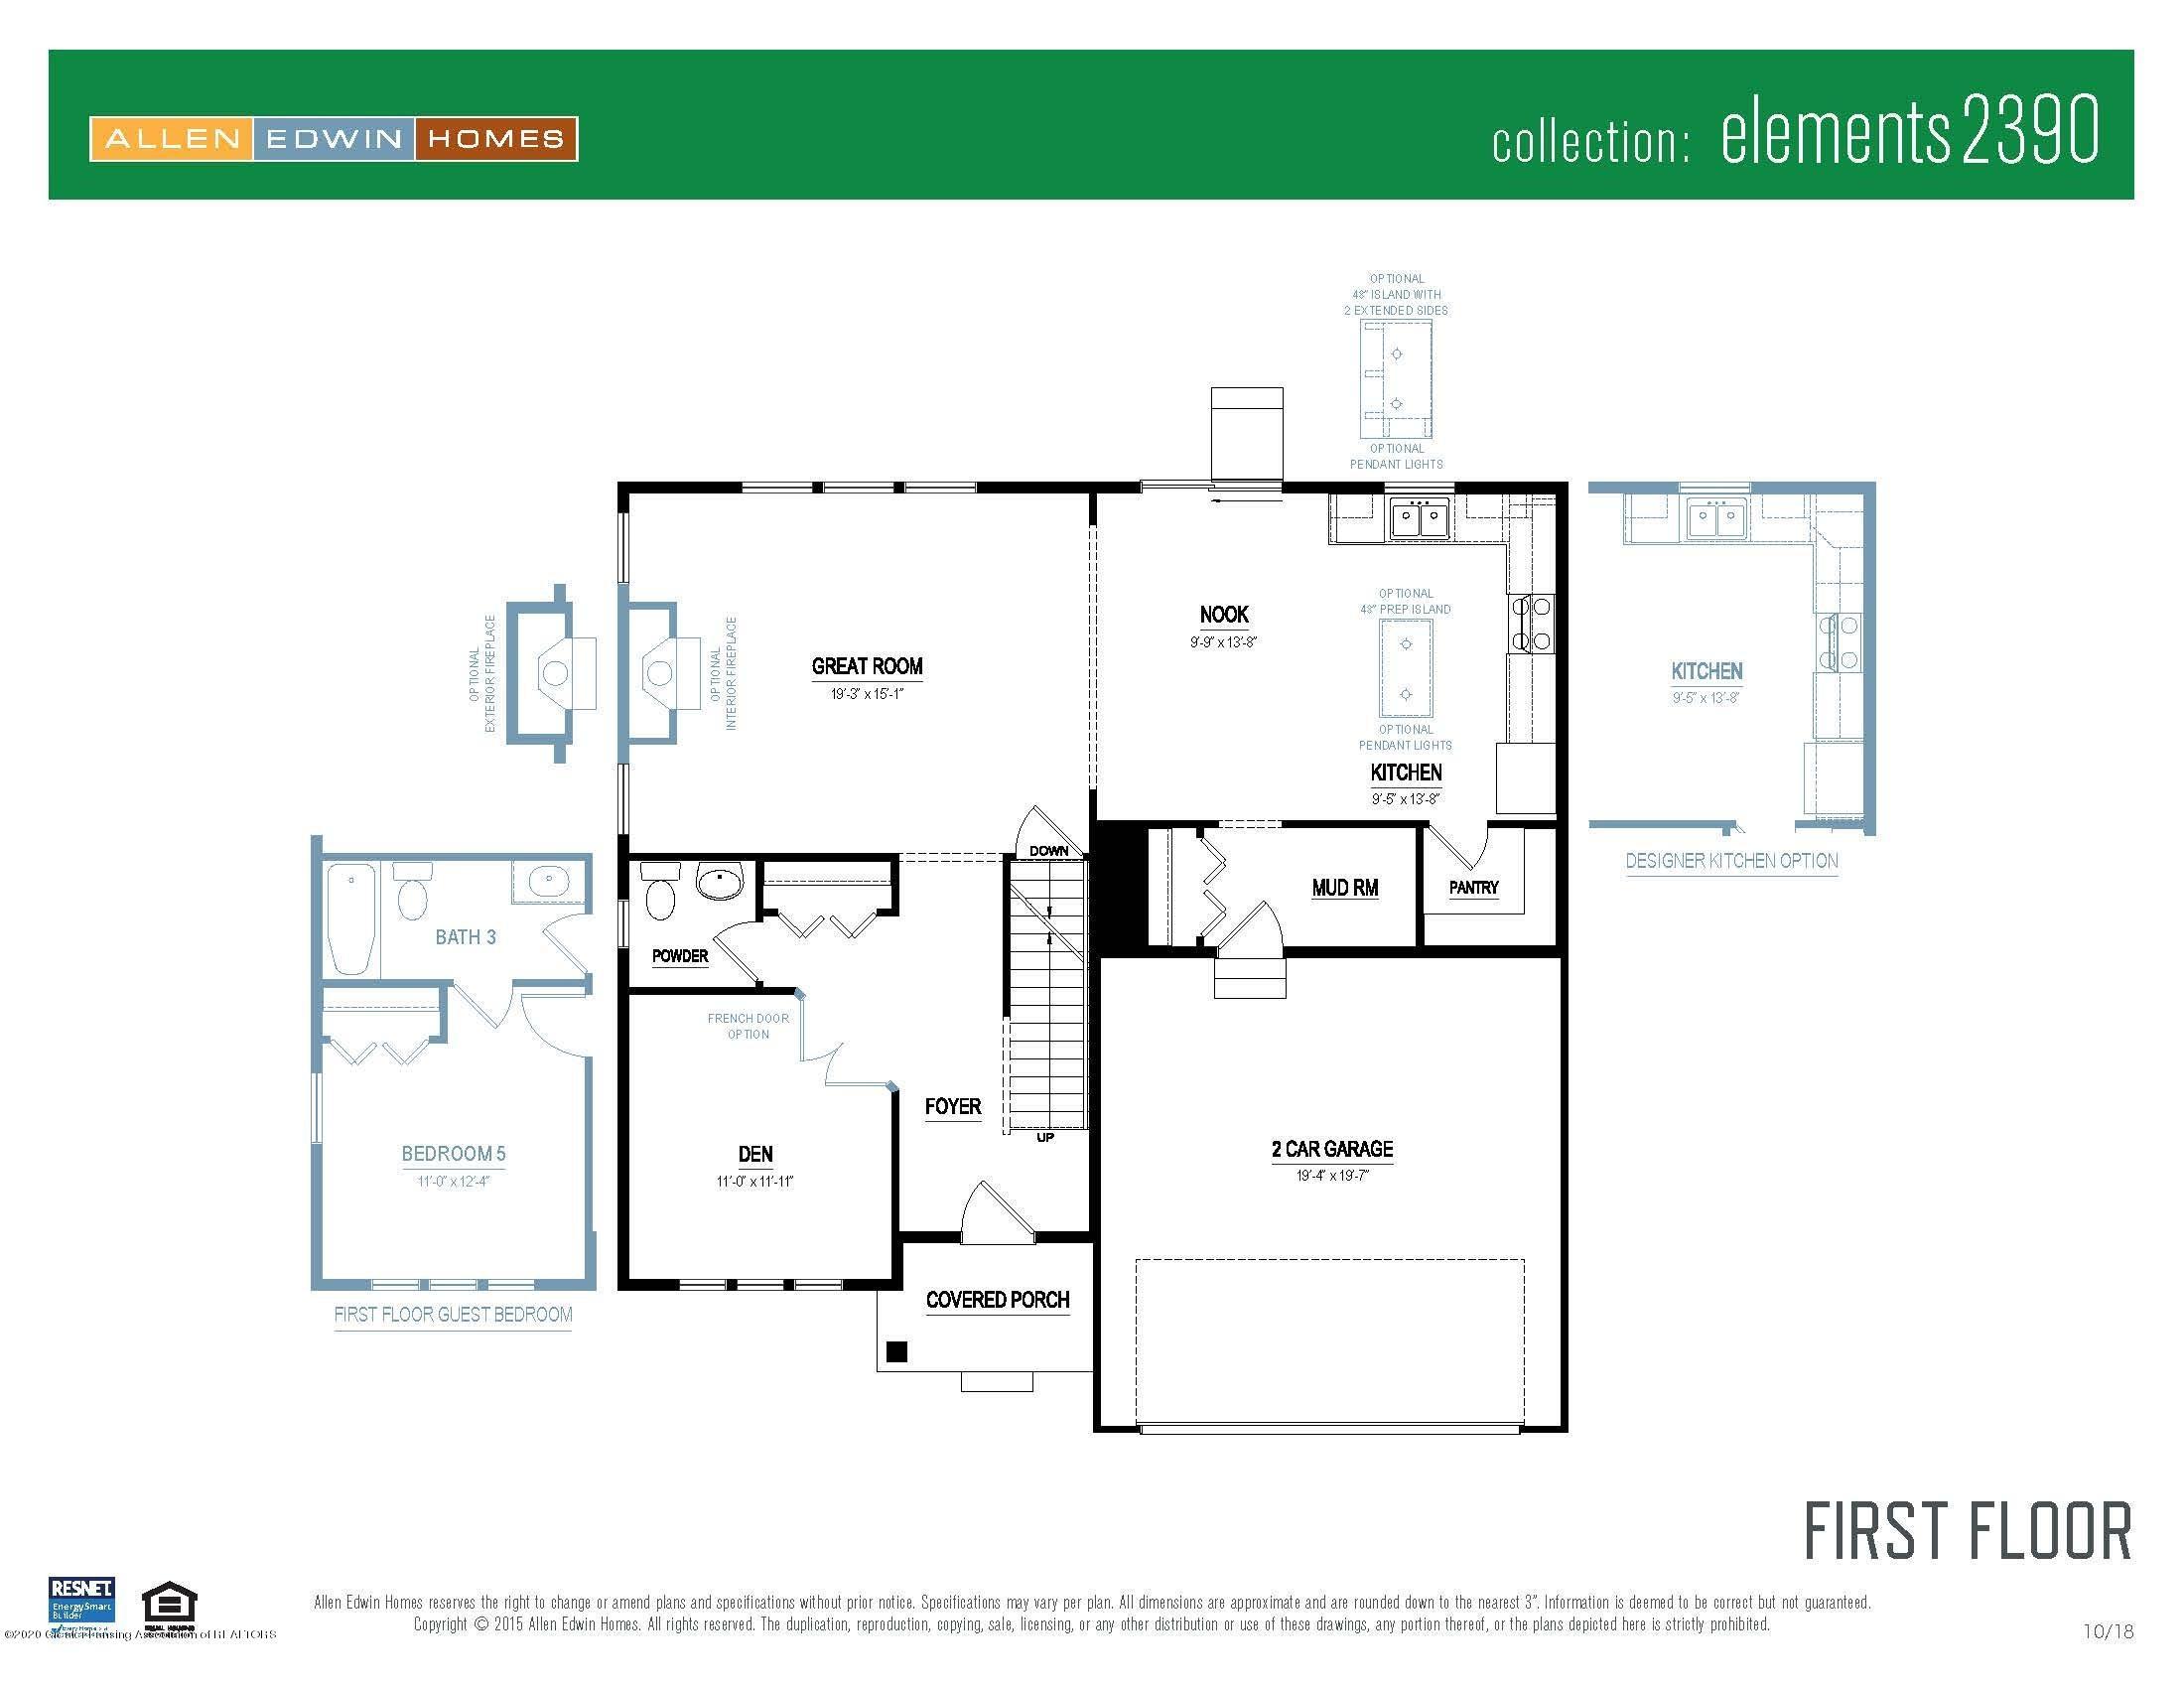 5344 Somerset Dr - Elements 2390 V8.0a First Floor - 20